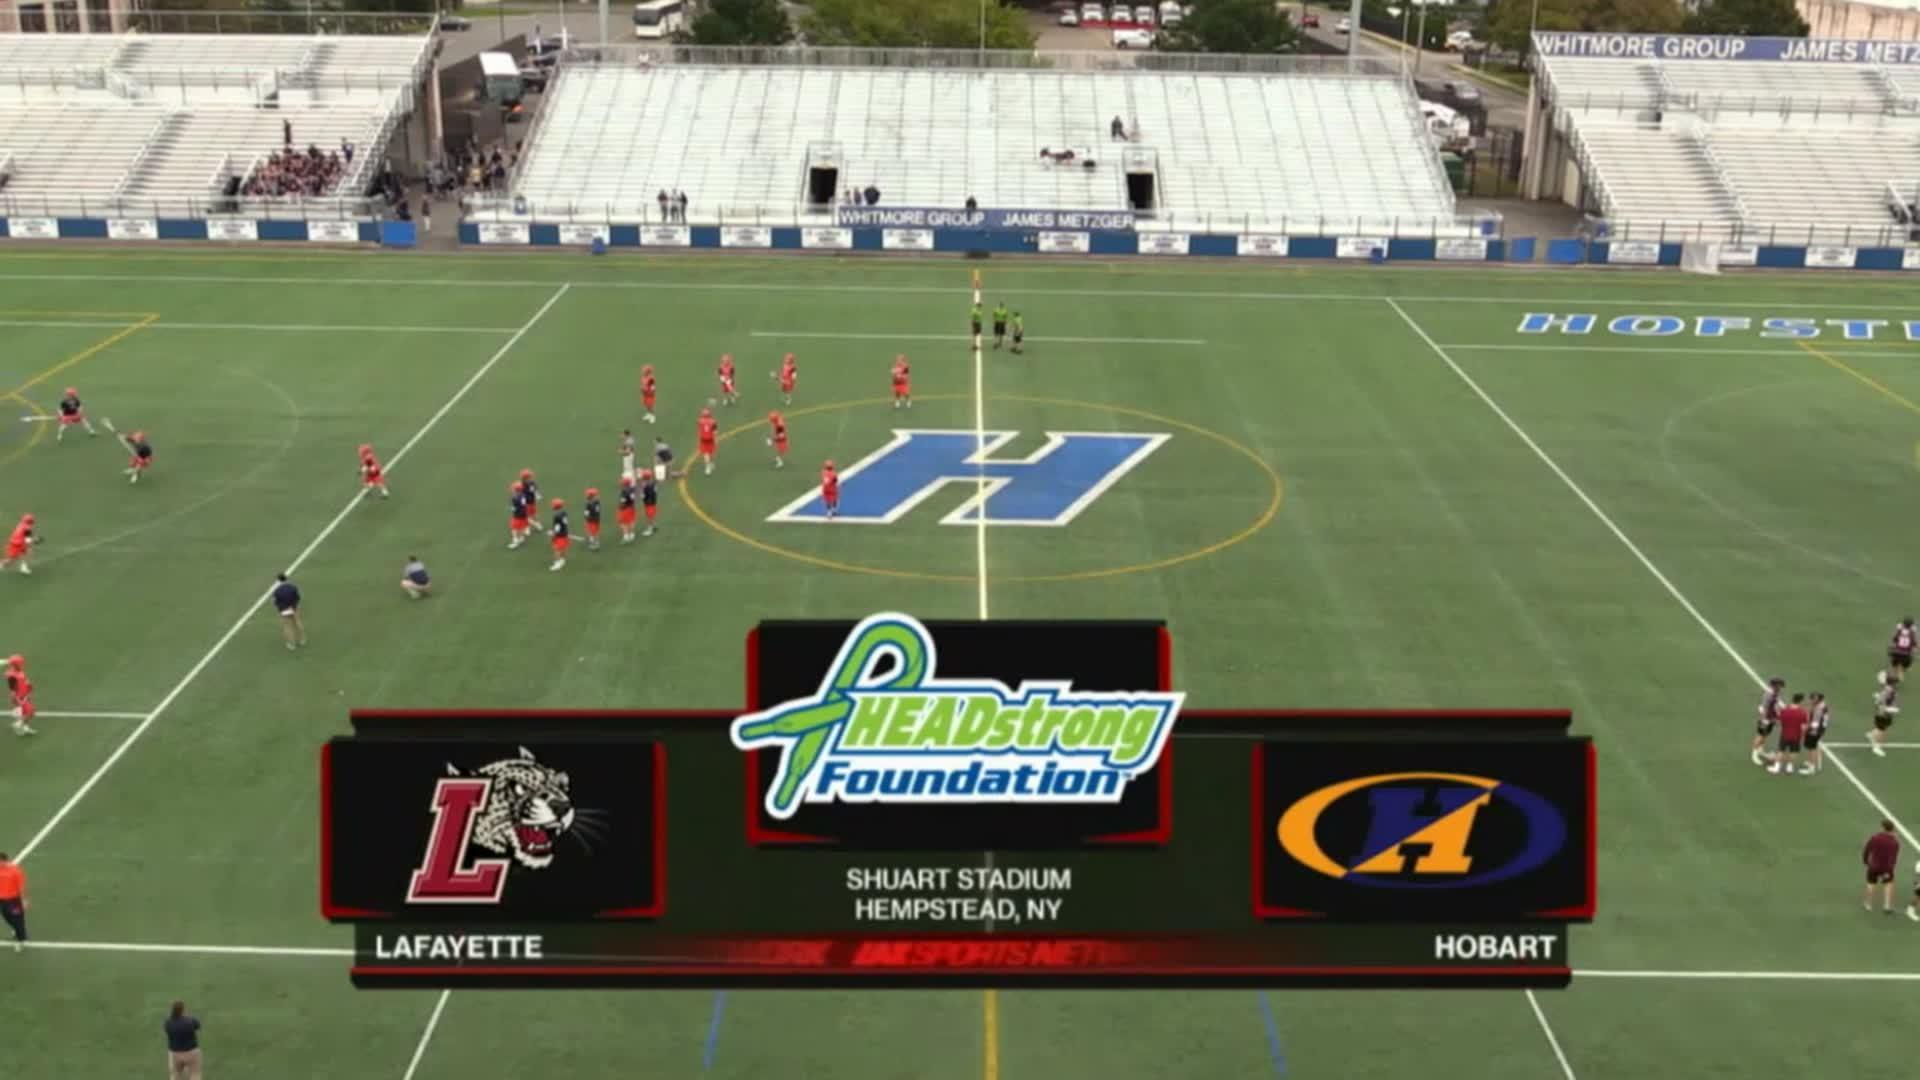 Headstrong Classic 10/8/16: Lafayette vs Hobart